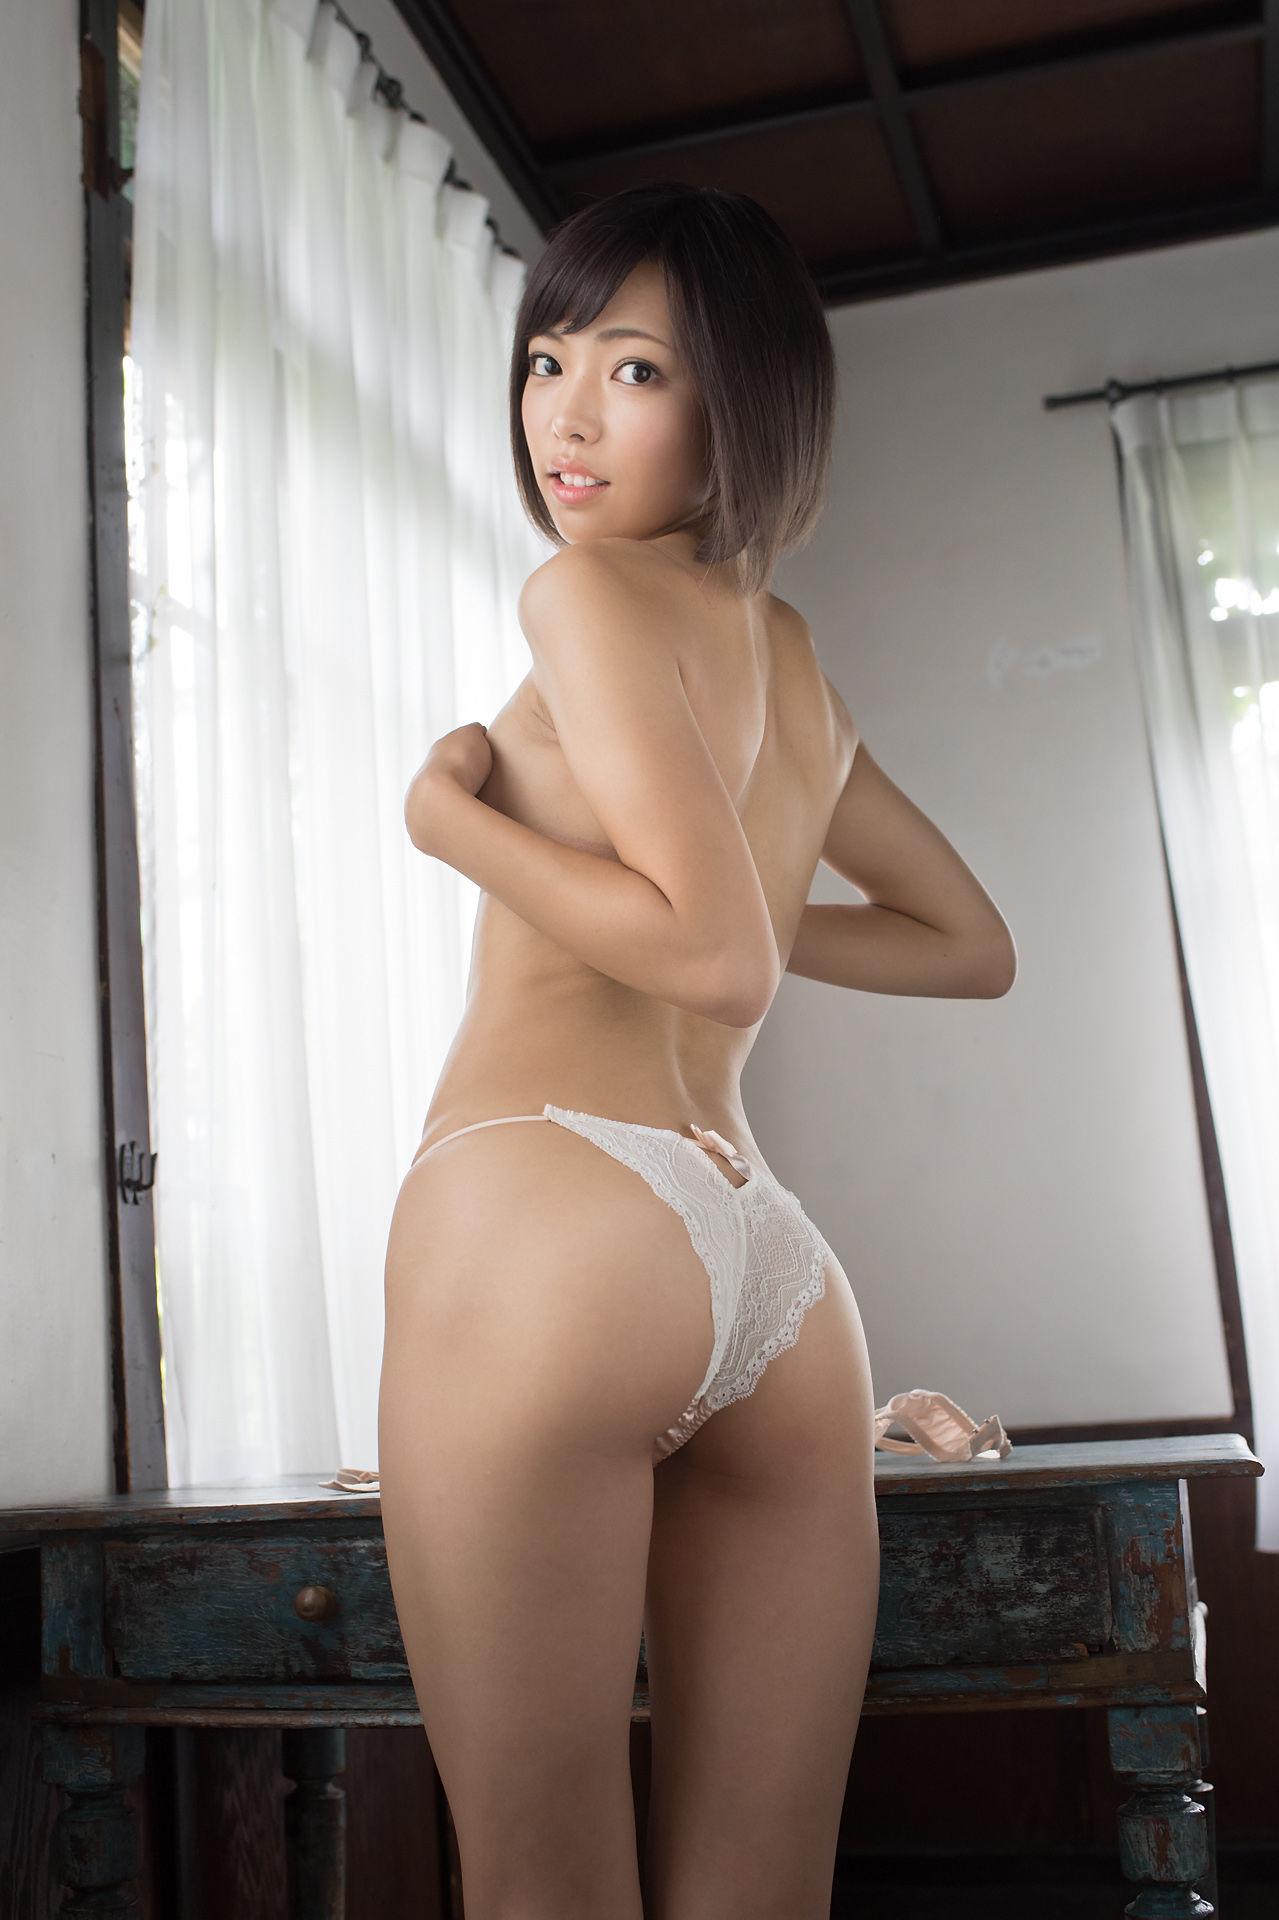 Aya Hirose 広瀬あや - Limited Gallery 01 写真套图